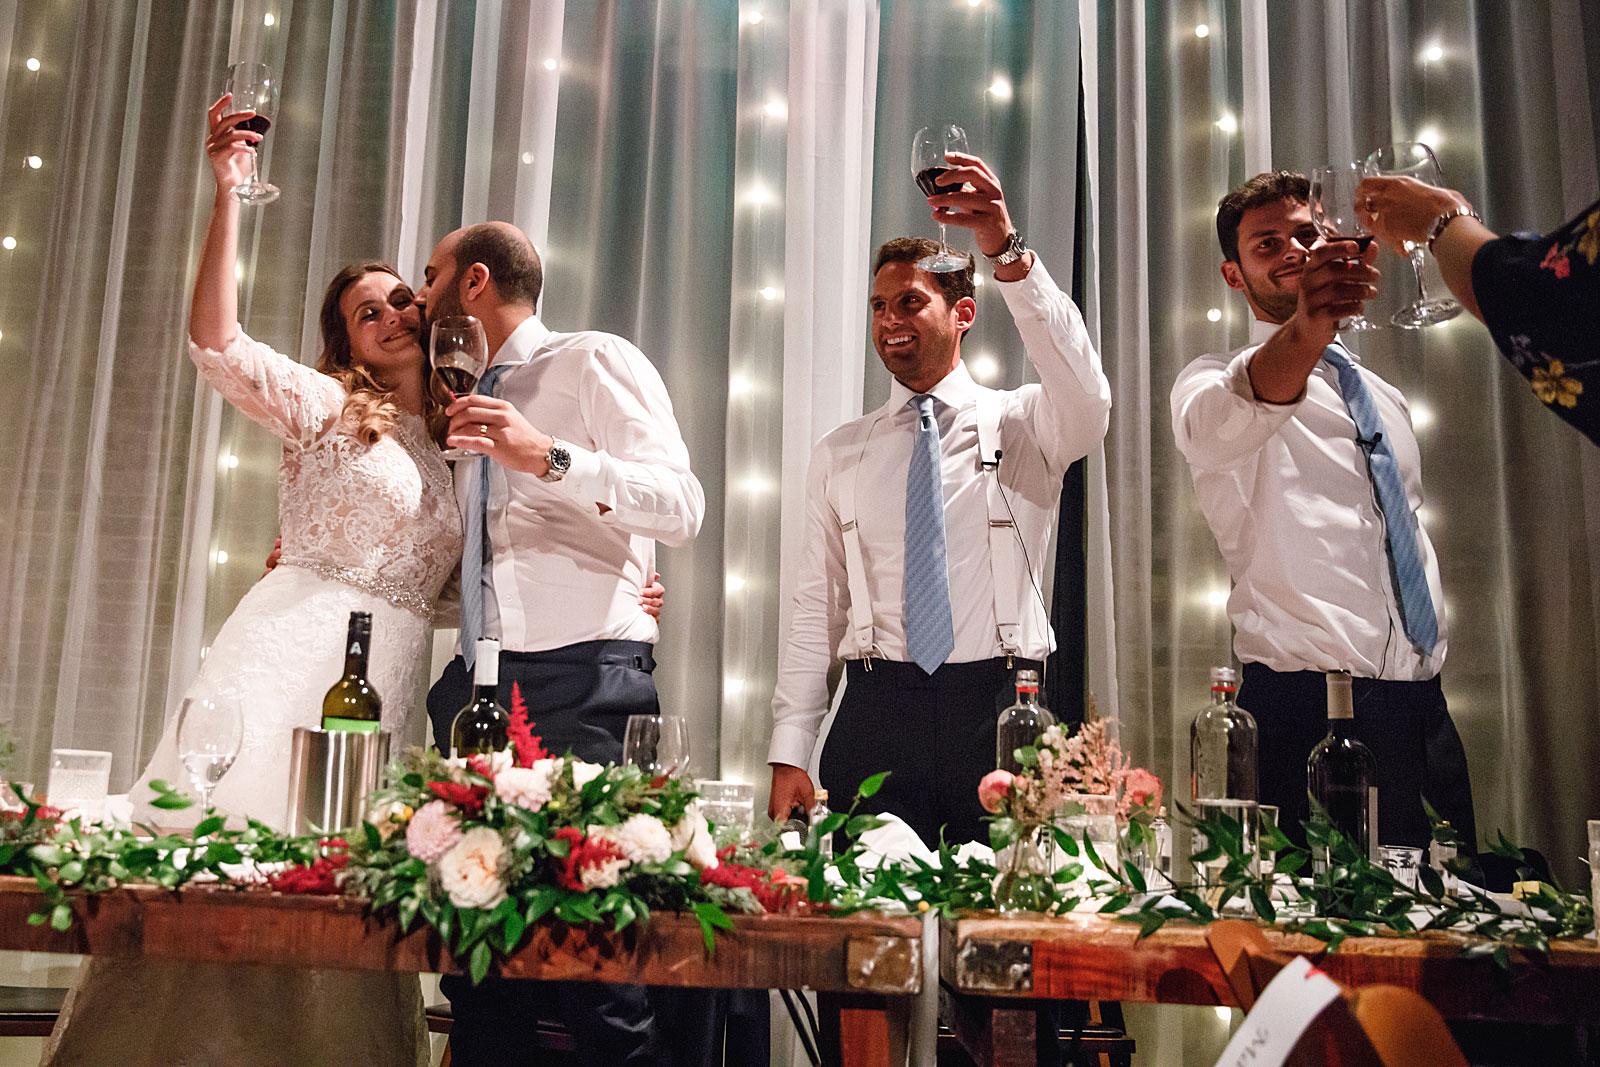 60-dinner-wedding-westerliefde-amsterdam